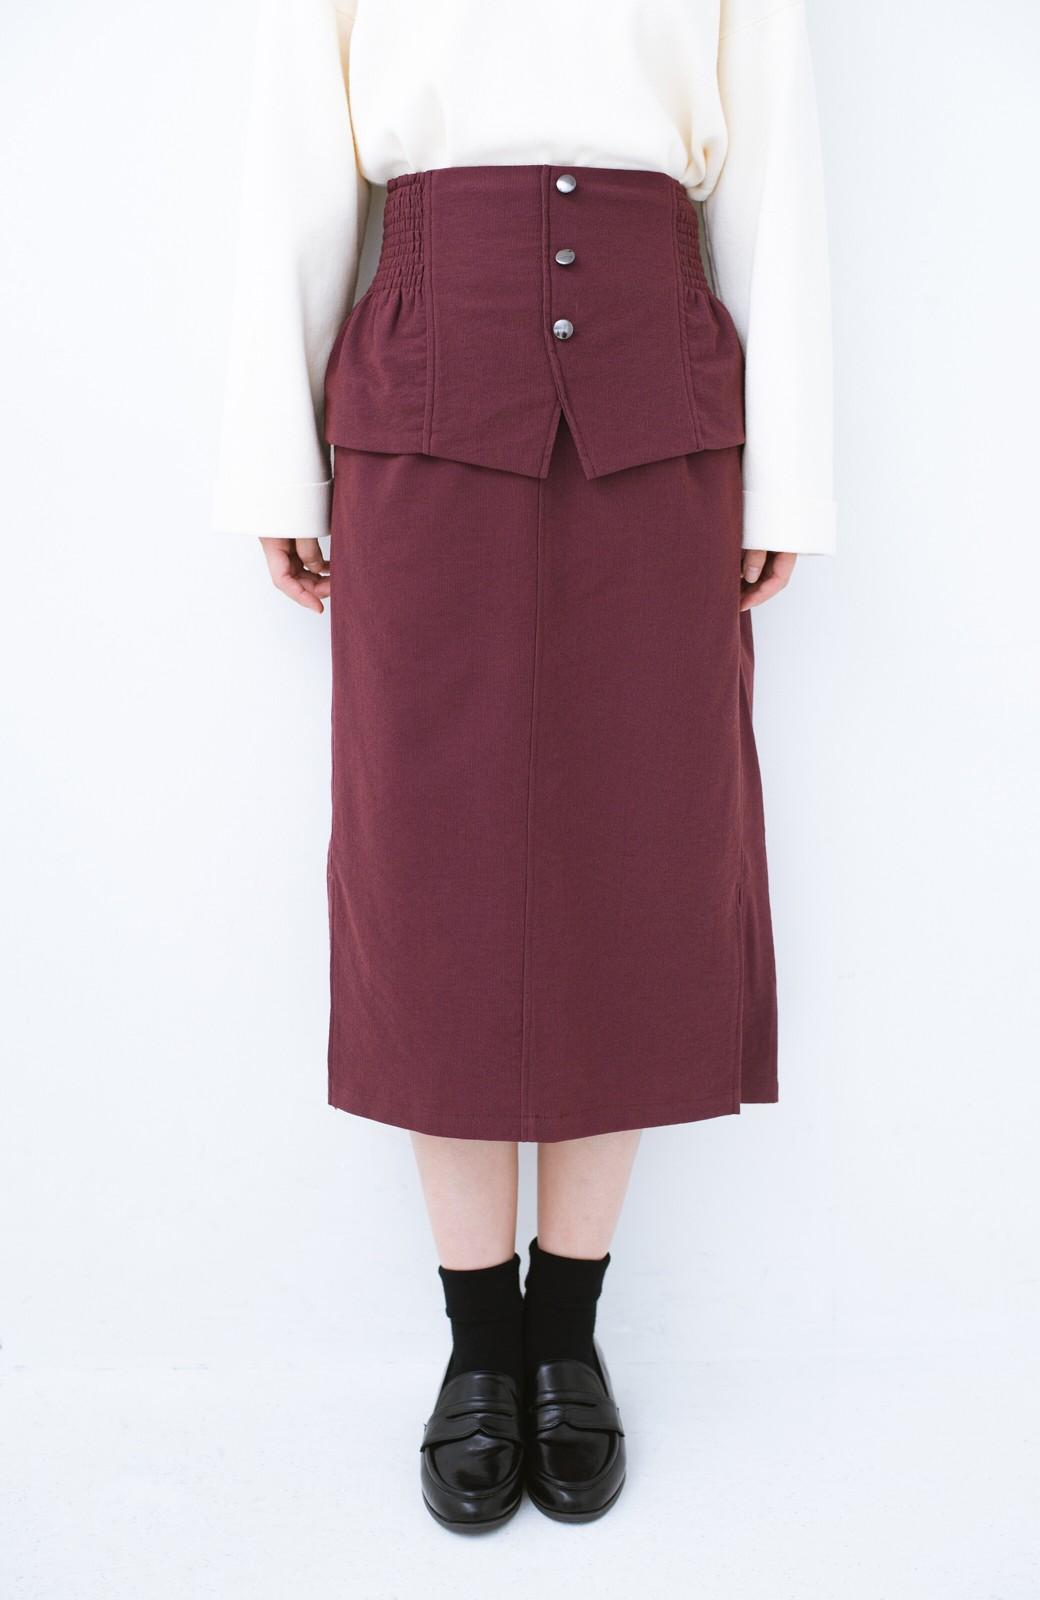 haco!  腹巻きとは呼ばせない ブルー期も華やかに過ごせる消臭加工裏地付きフリルデザインスカートセット【ブルー期】女の子バンザイ!プロジェクト <ボルドー>の商品写真9